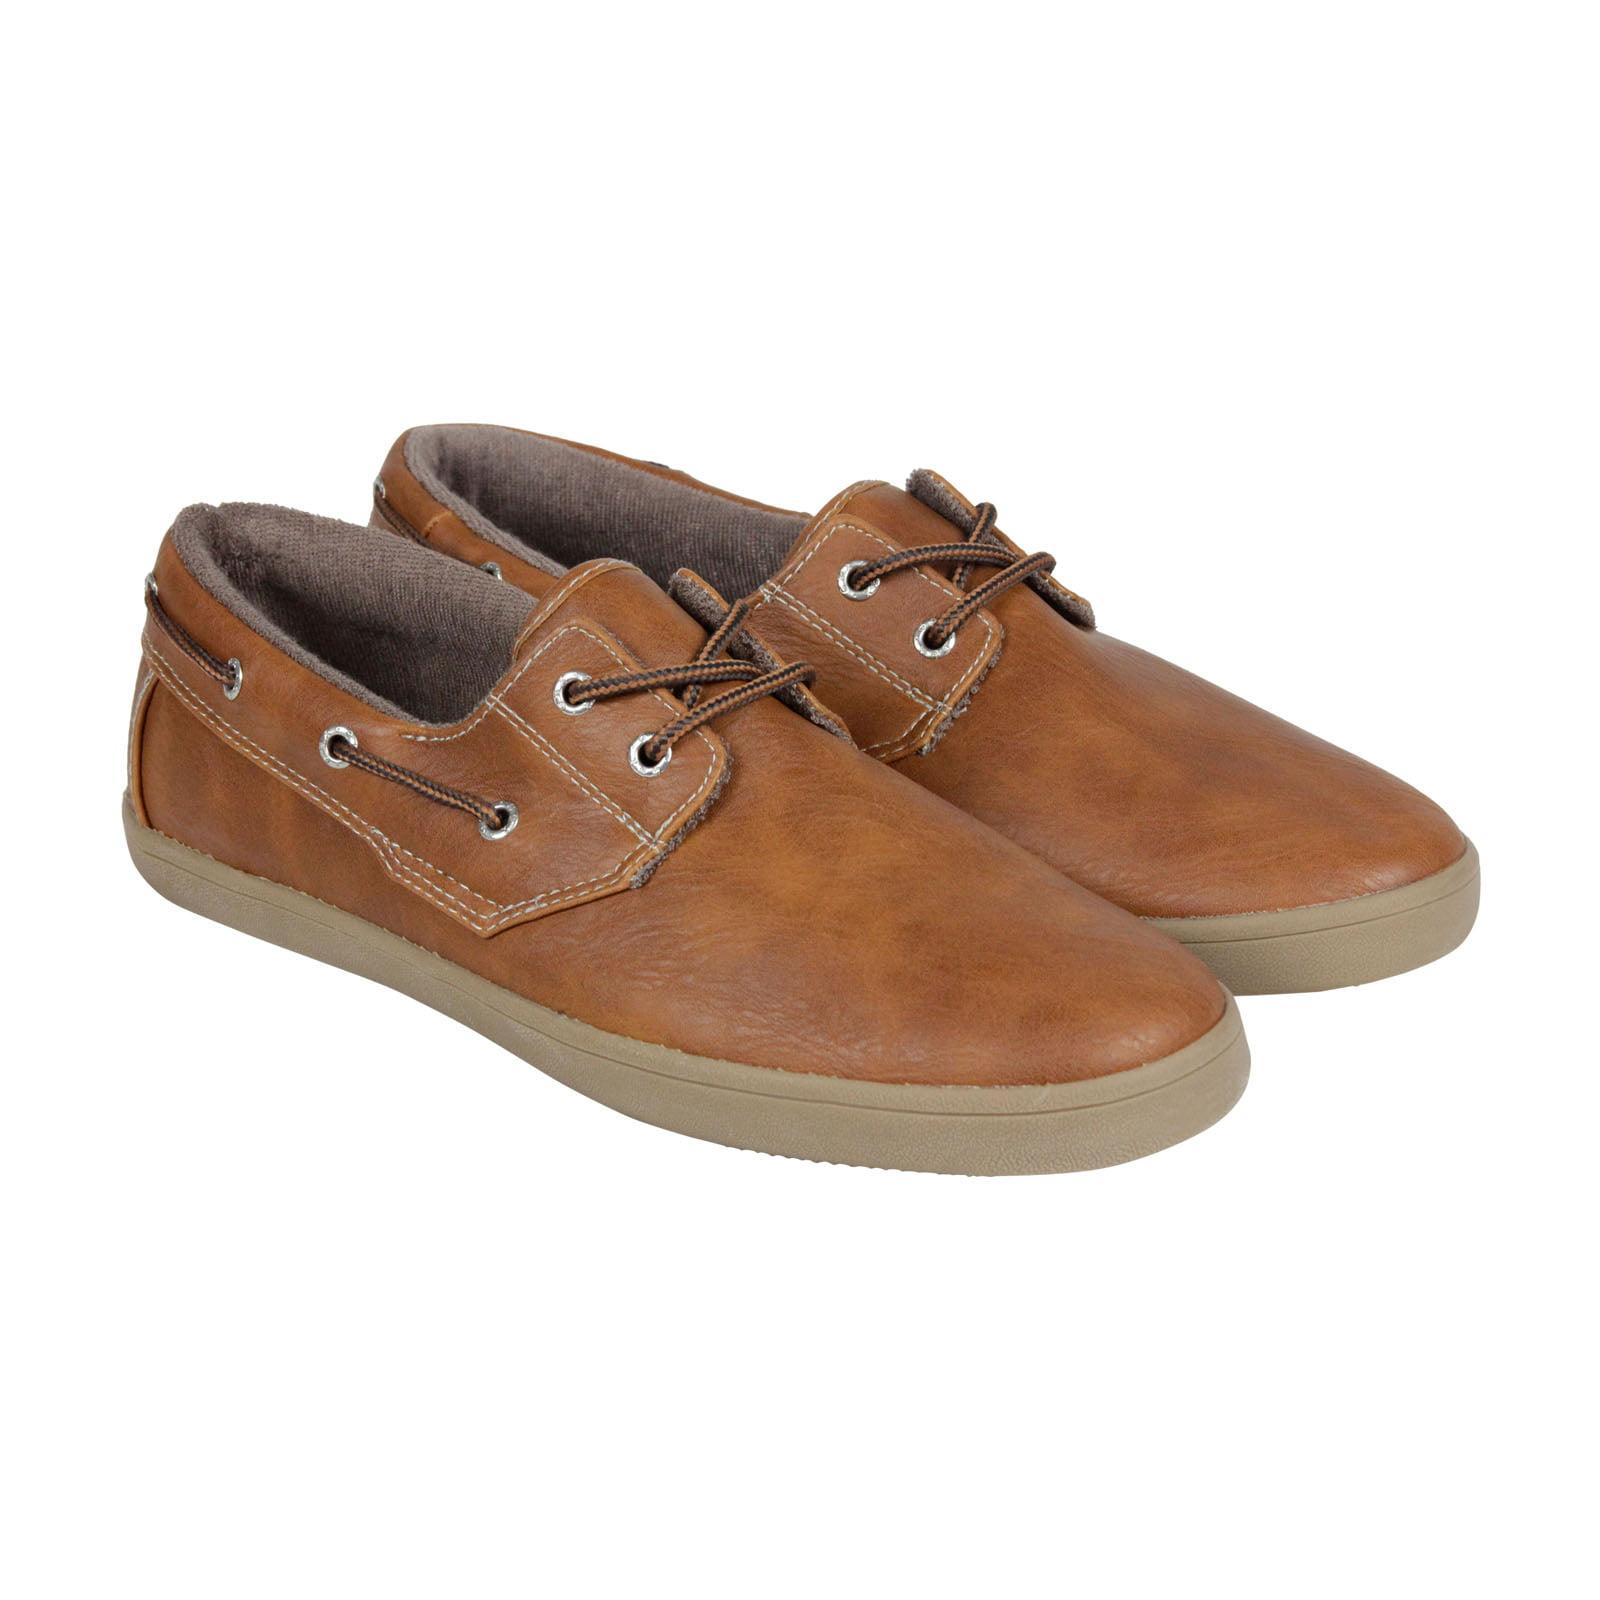 GBX Lott Mens Tan Casual Dress Slip On Boat Shoes Shoes by GBX